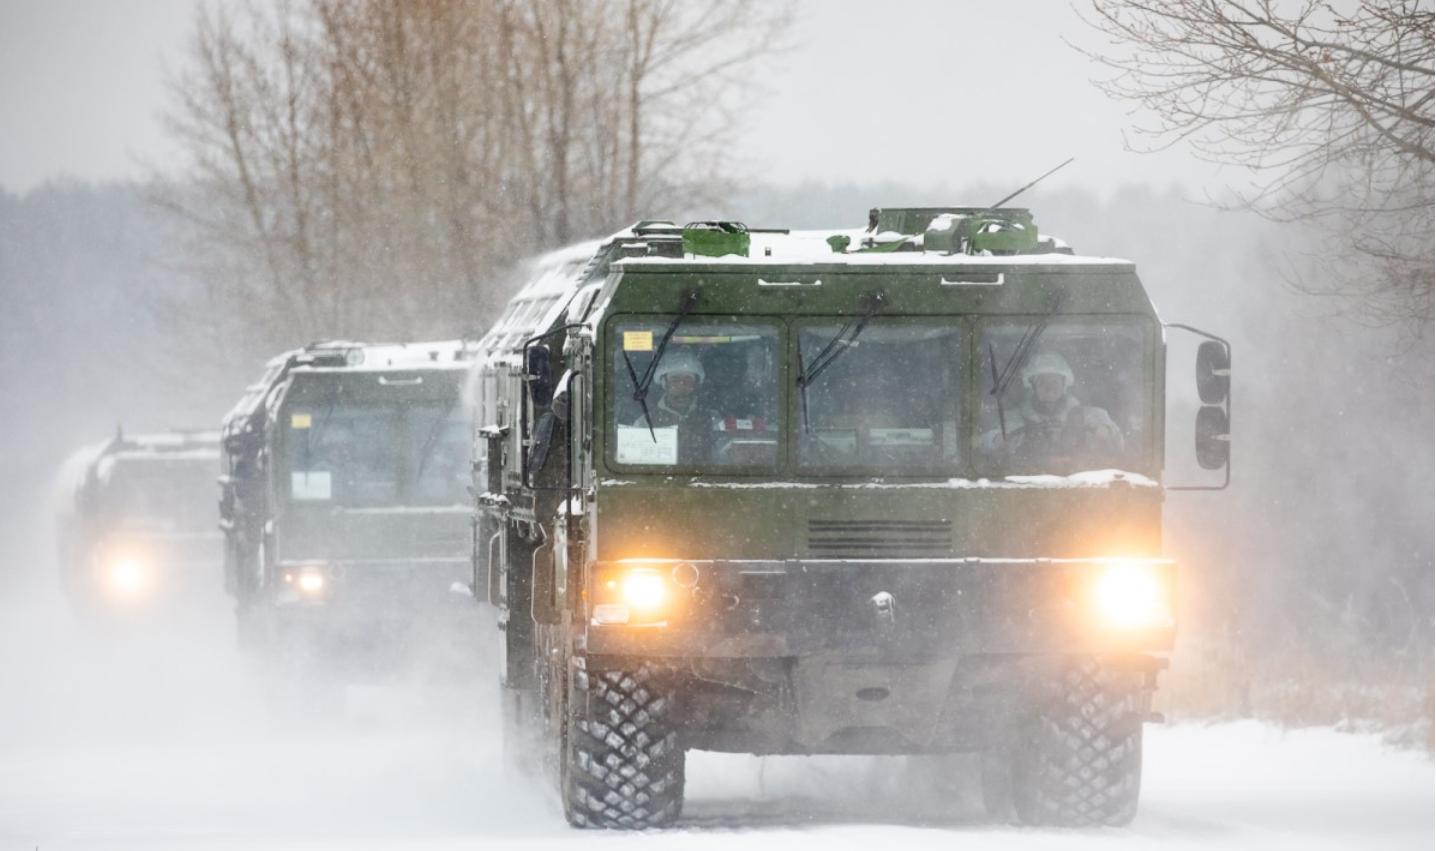 Rosja zbroi Kaliningrad. Drony, czołgi, samoloty, Iskandery